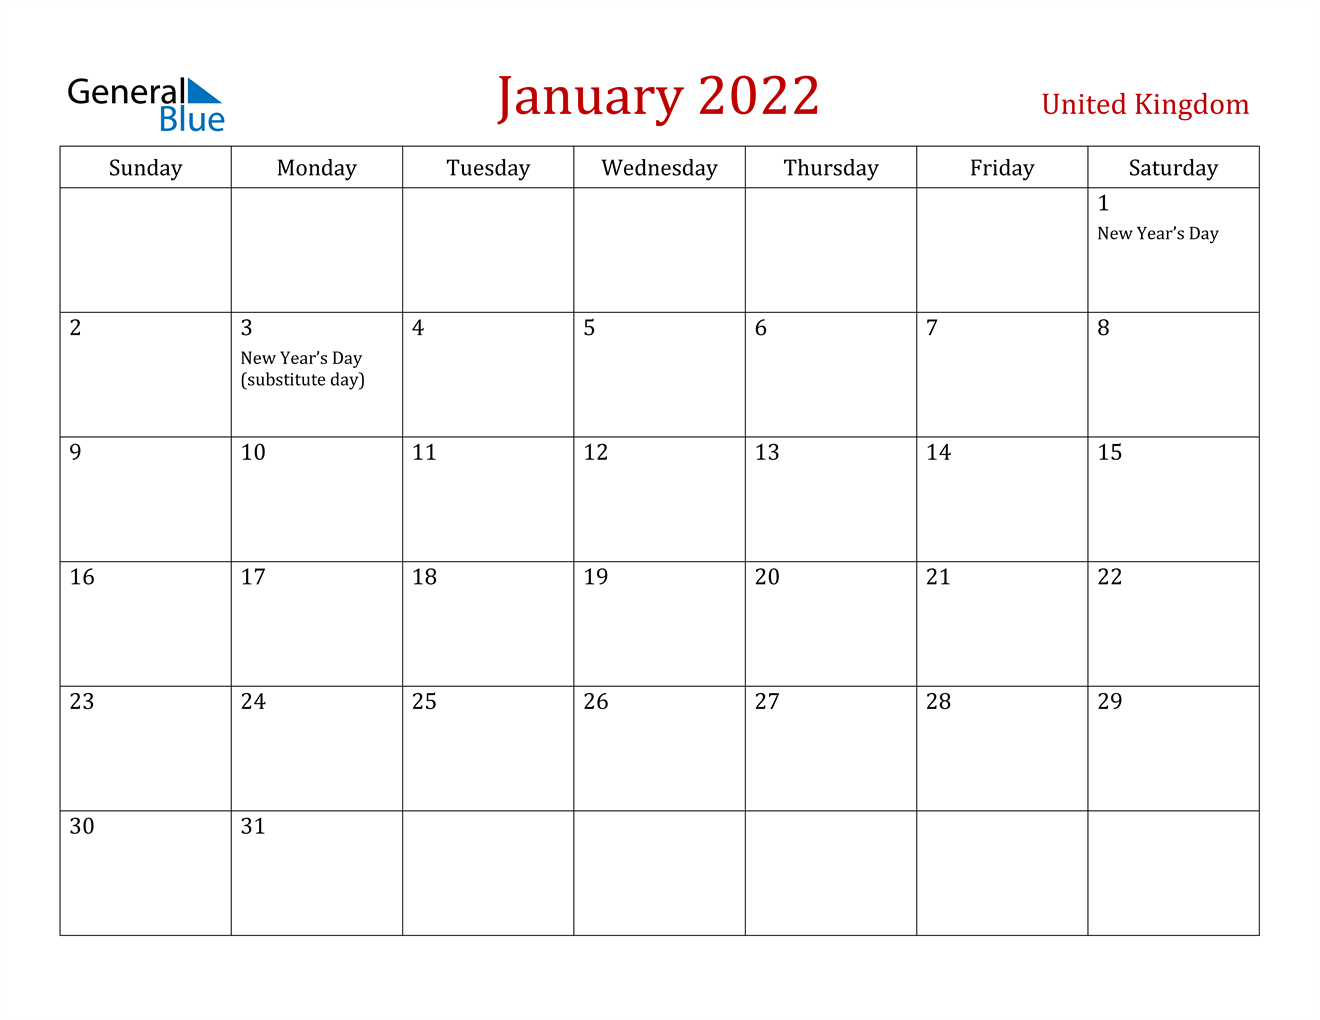 January 2022 Calendar - United Kingdom inside Empty January 2022 Calendar